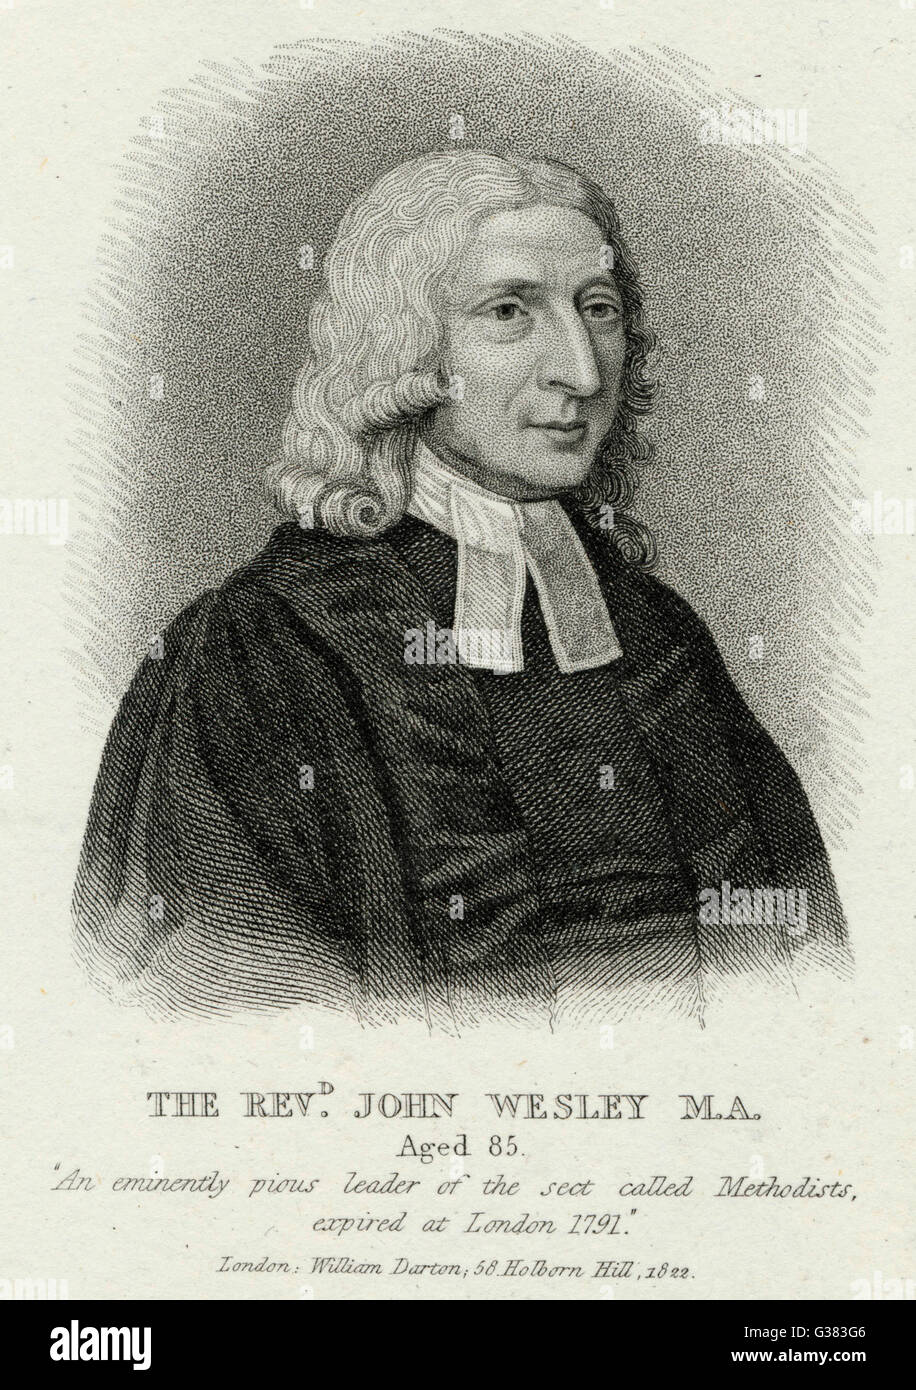 JOHN WESLEY  English religious leader  aged 85       Date: 1703 - 1791 - Stock Image